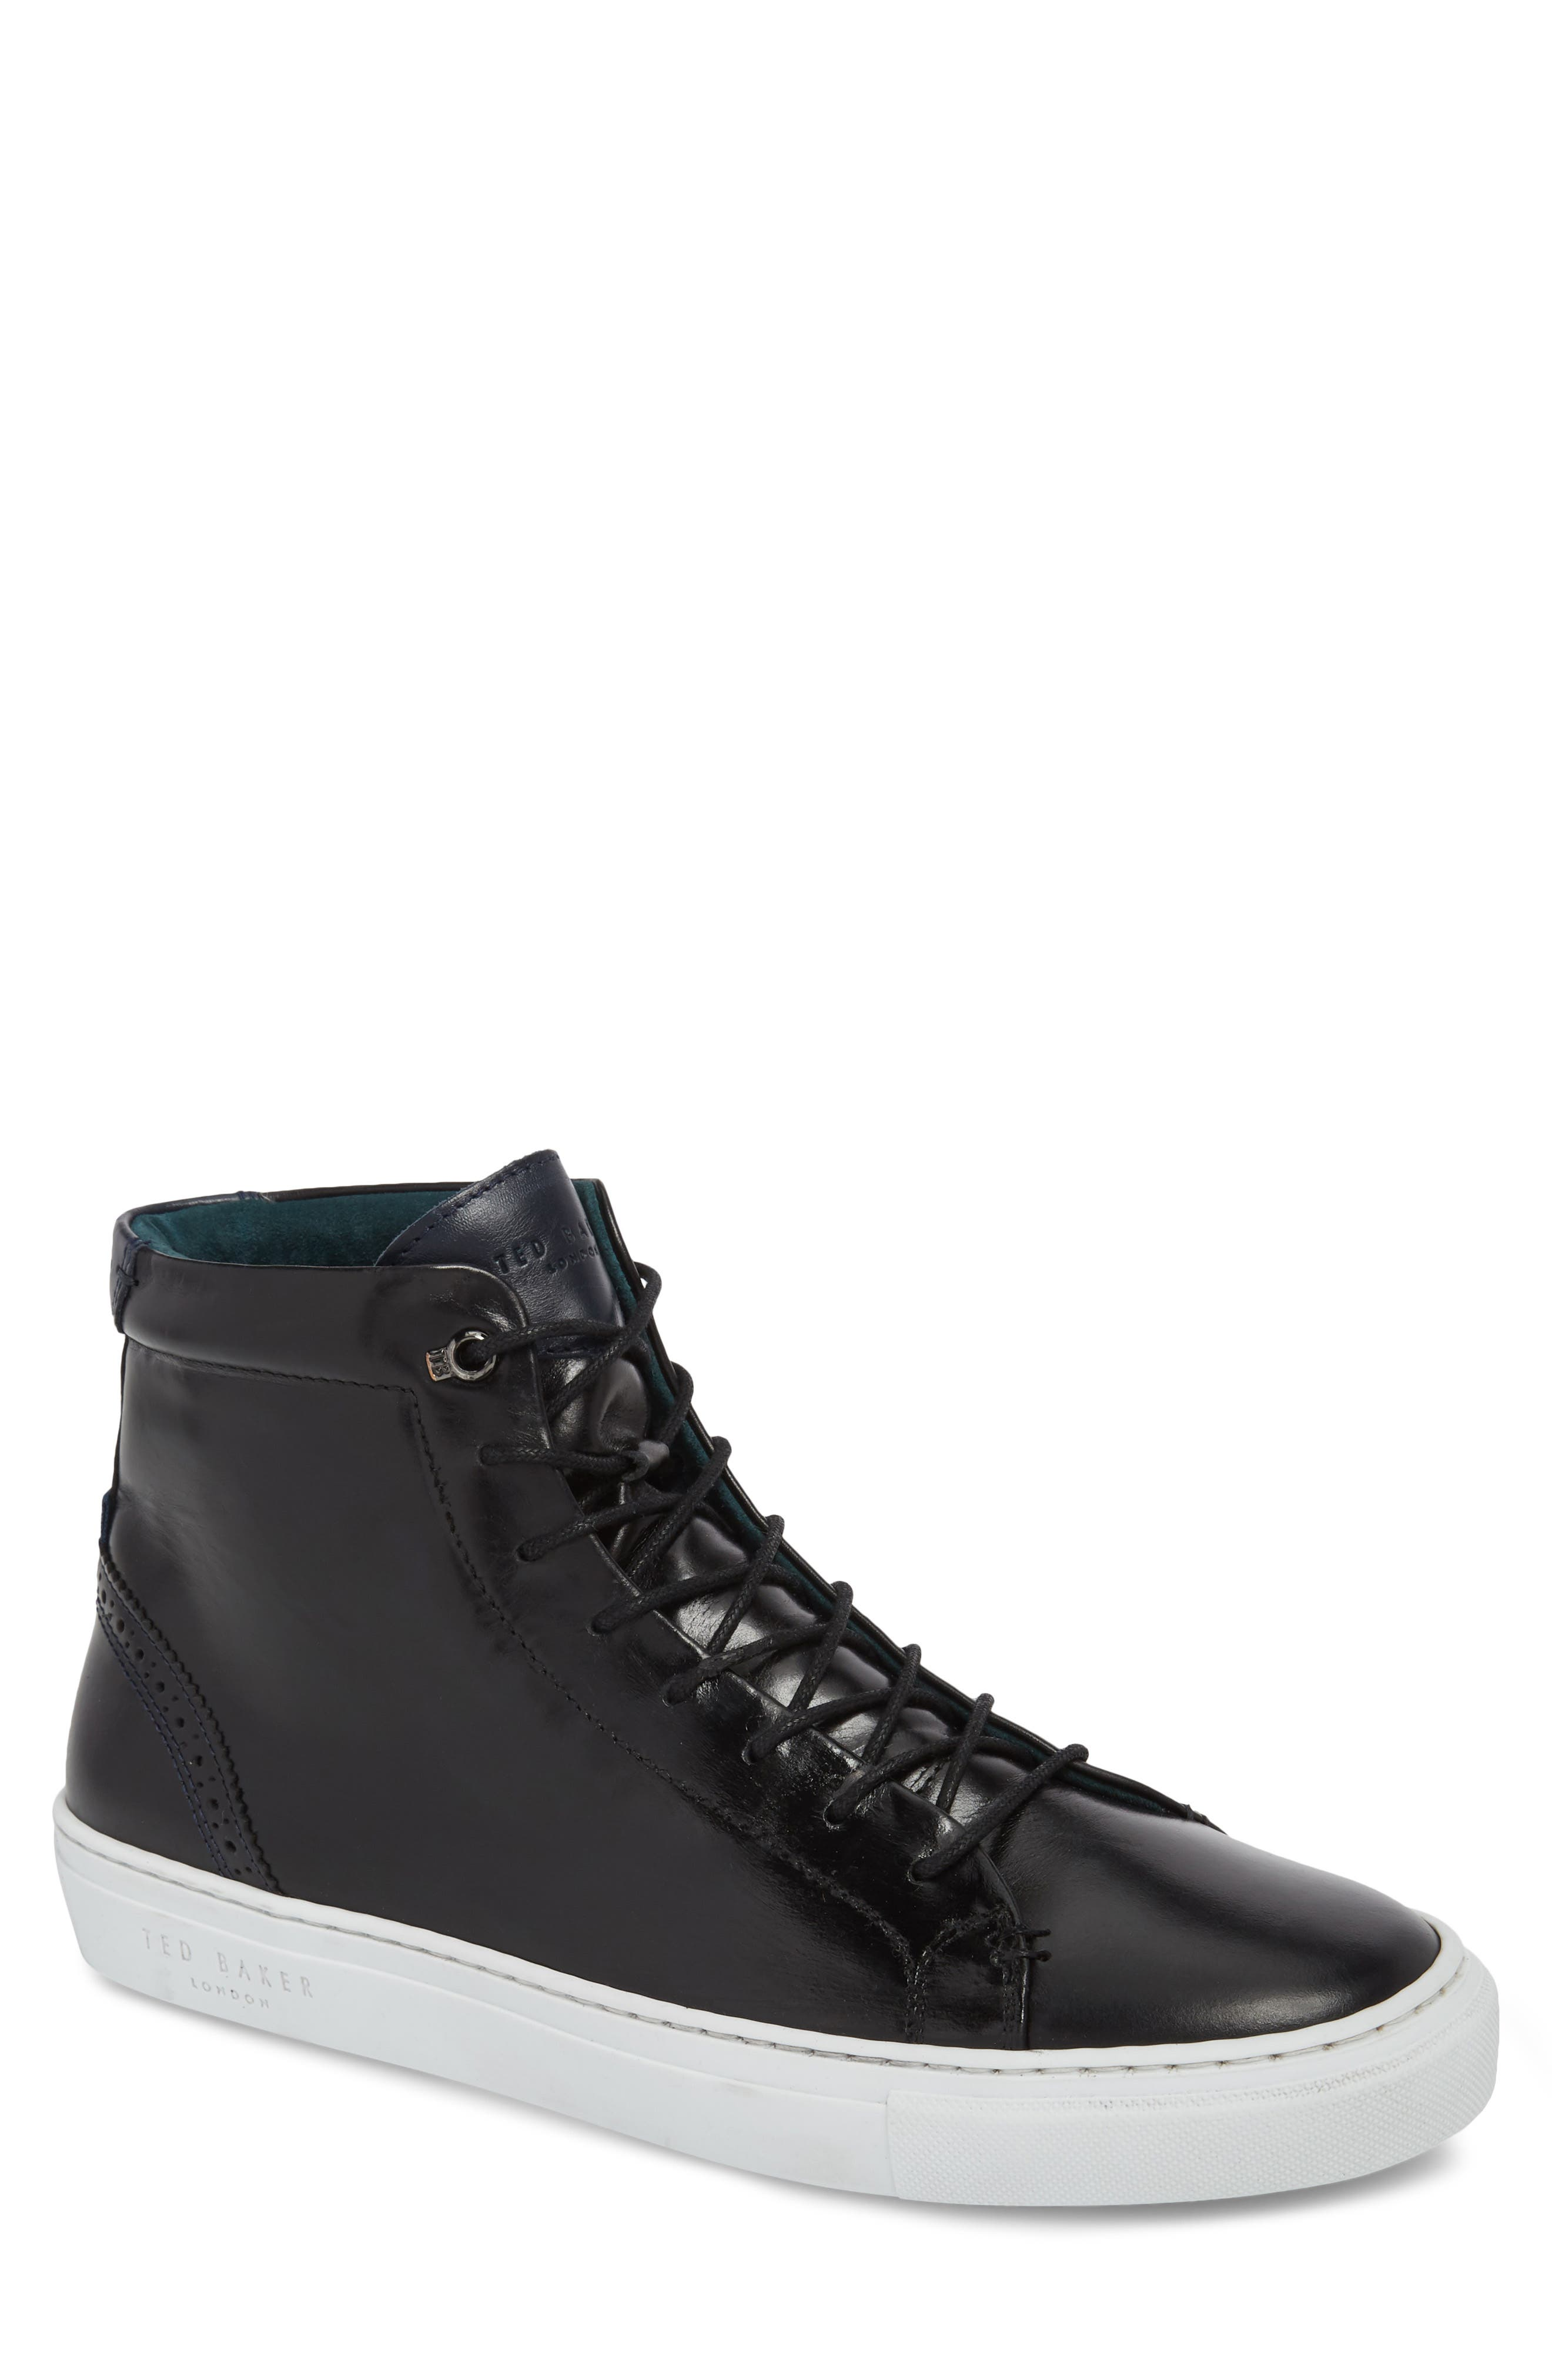 Monerkk High Top Sneaker,                         Main,                         color, 001